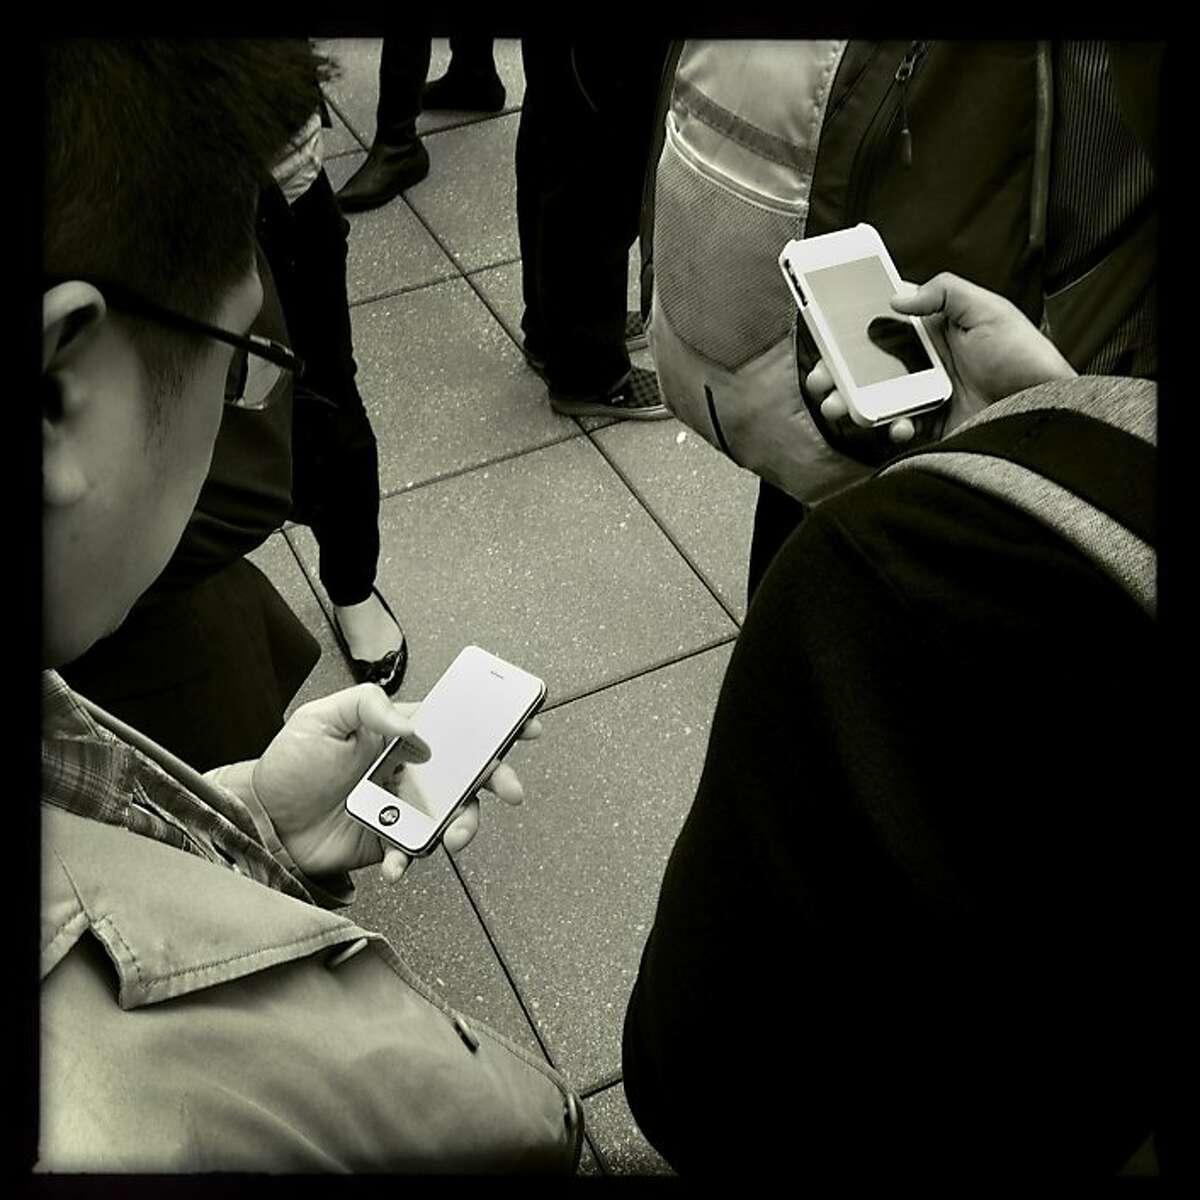 People use their smartphones.